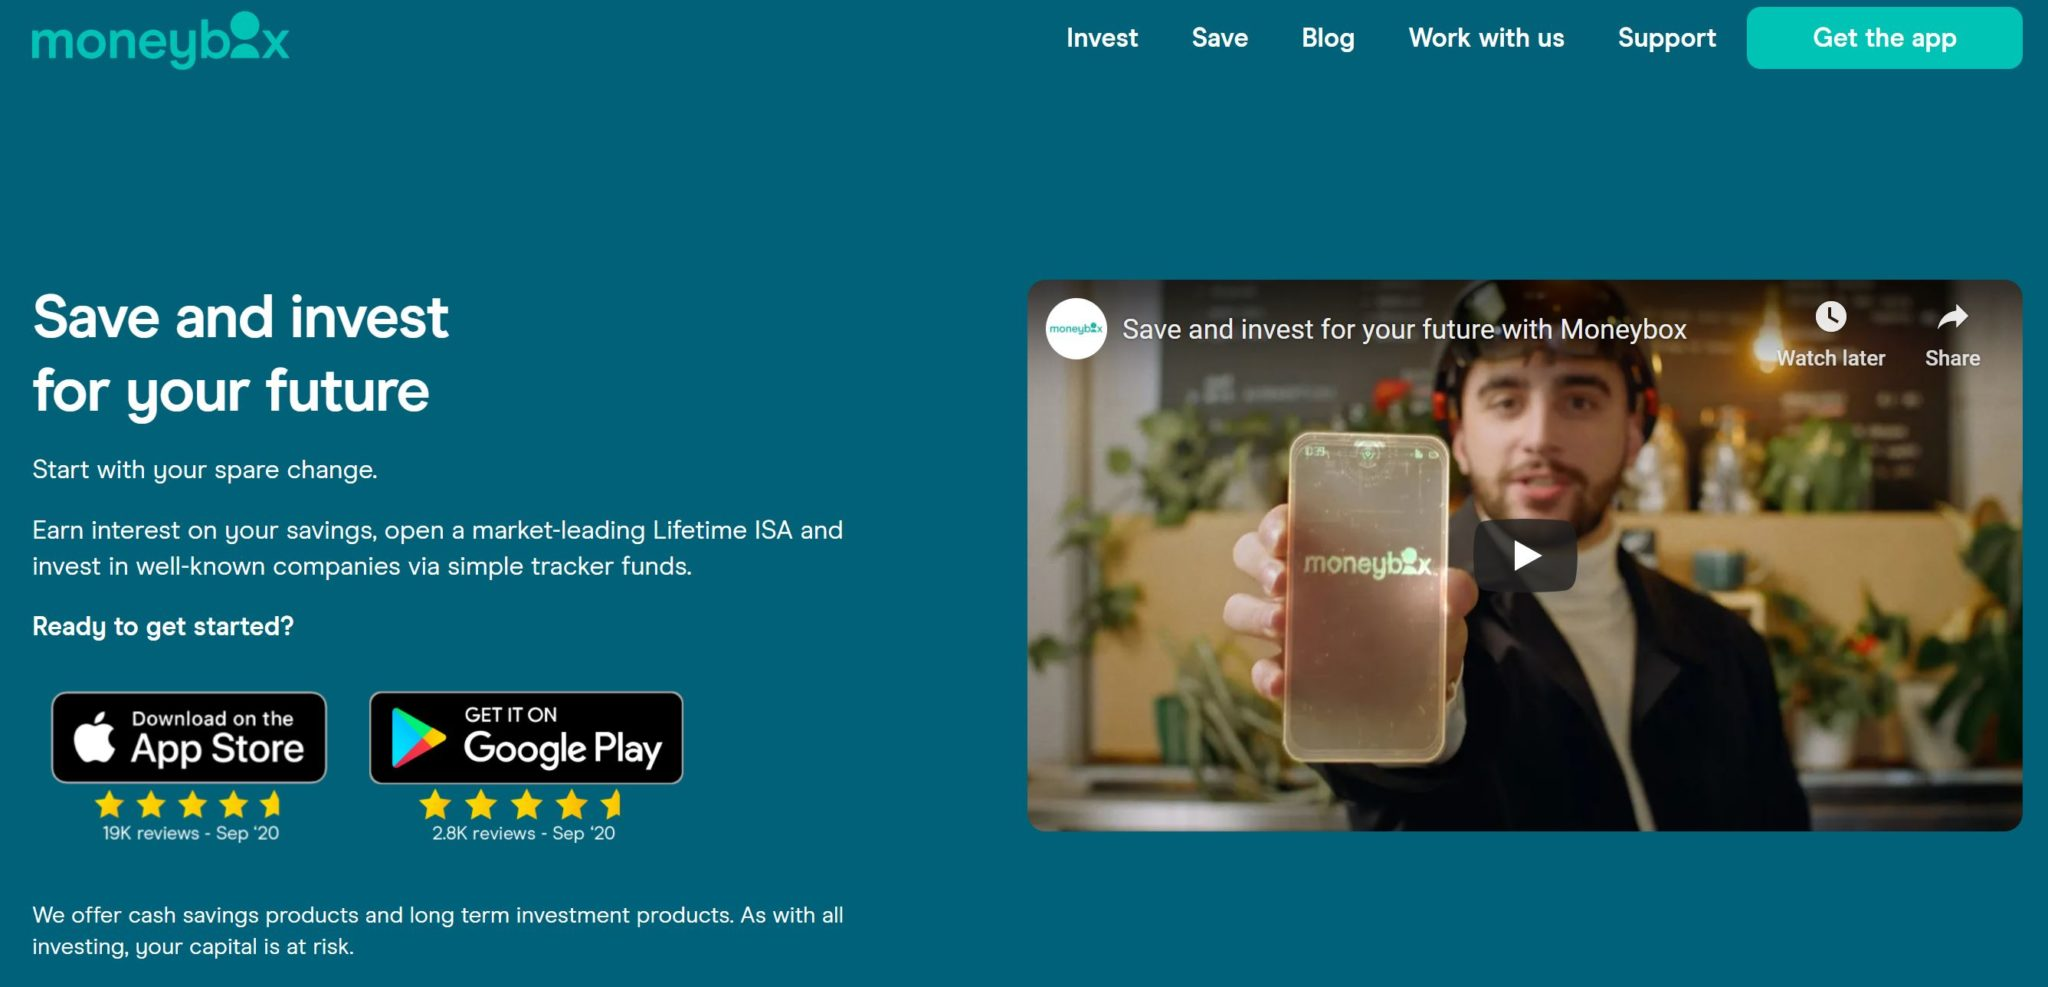 Moneybox app review